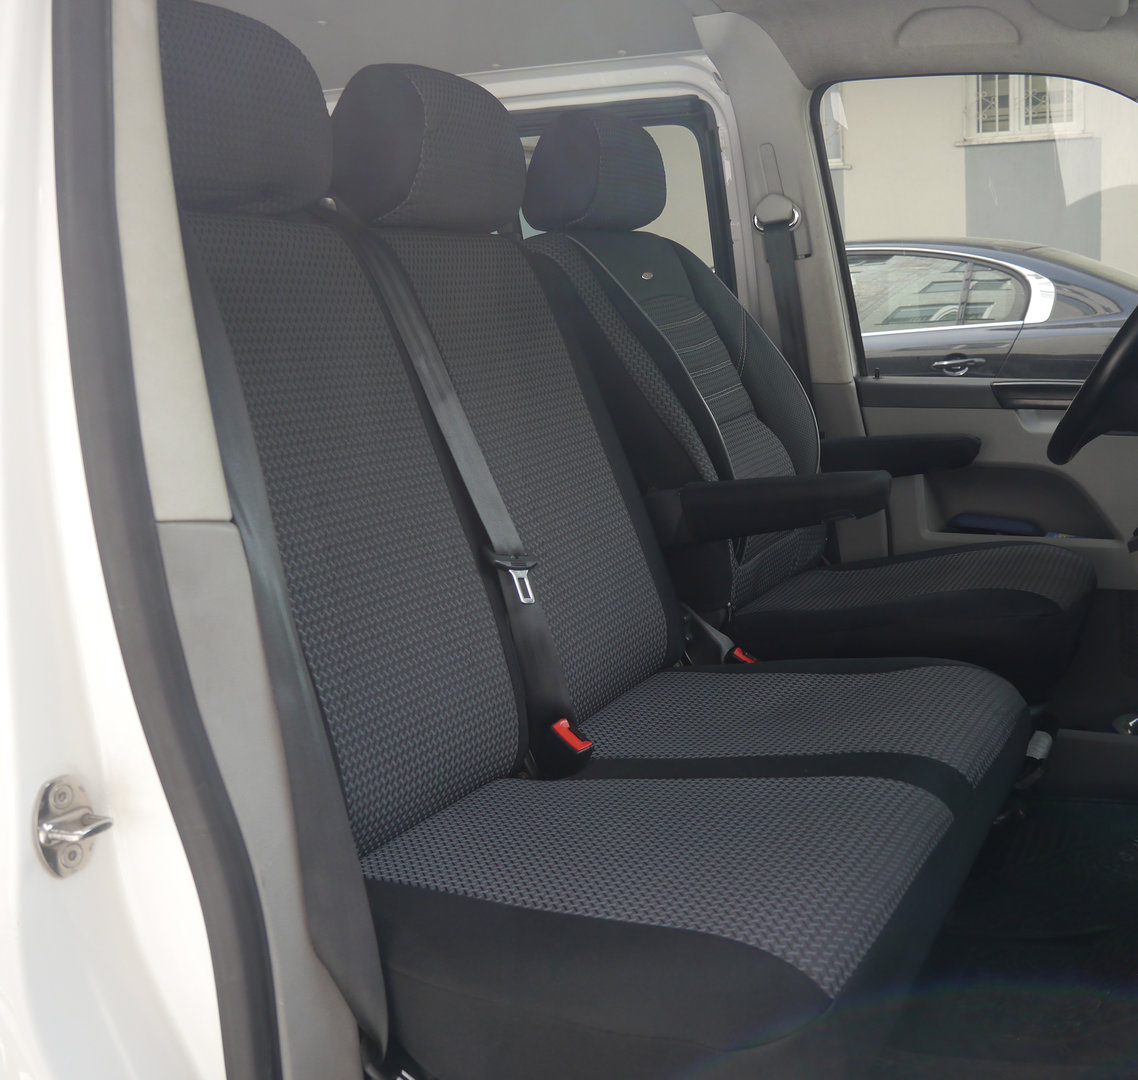 car seat covers vw t6 kombi for 9 seats. Black Bedroom Furniture Sets. Home Design Ideas